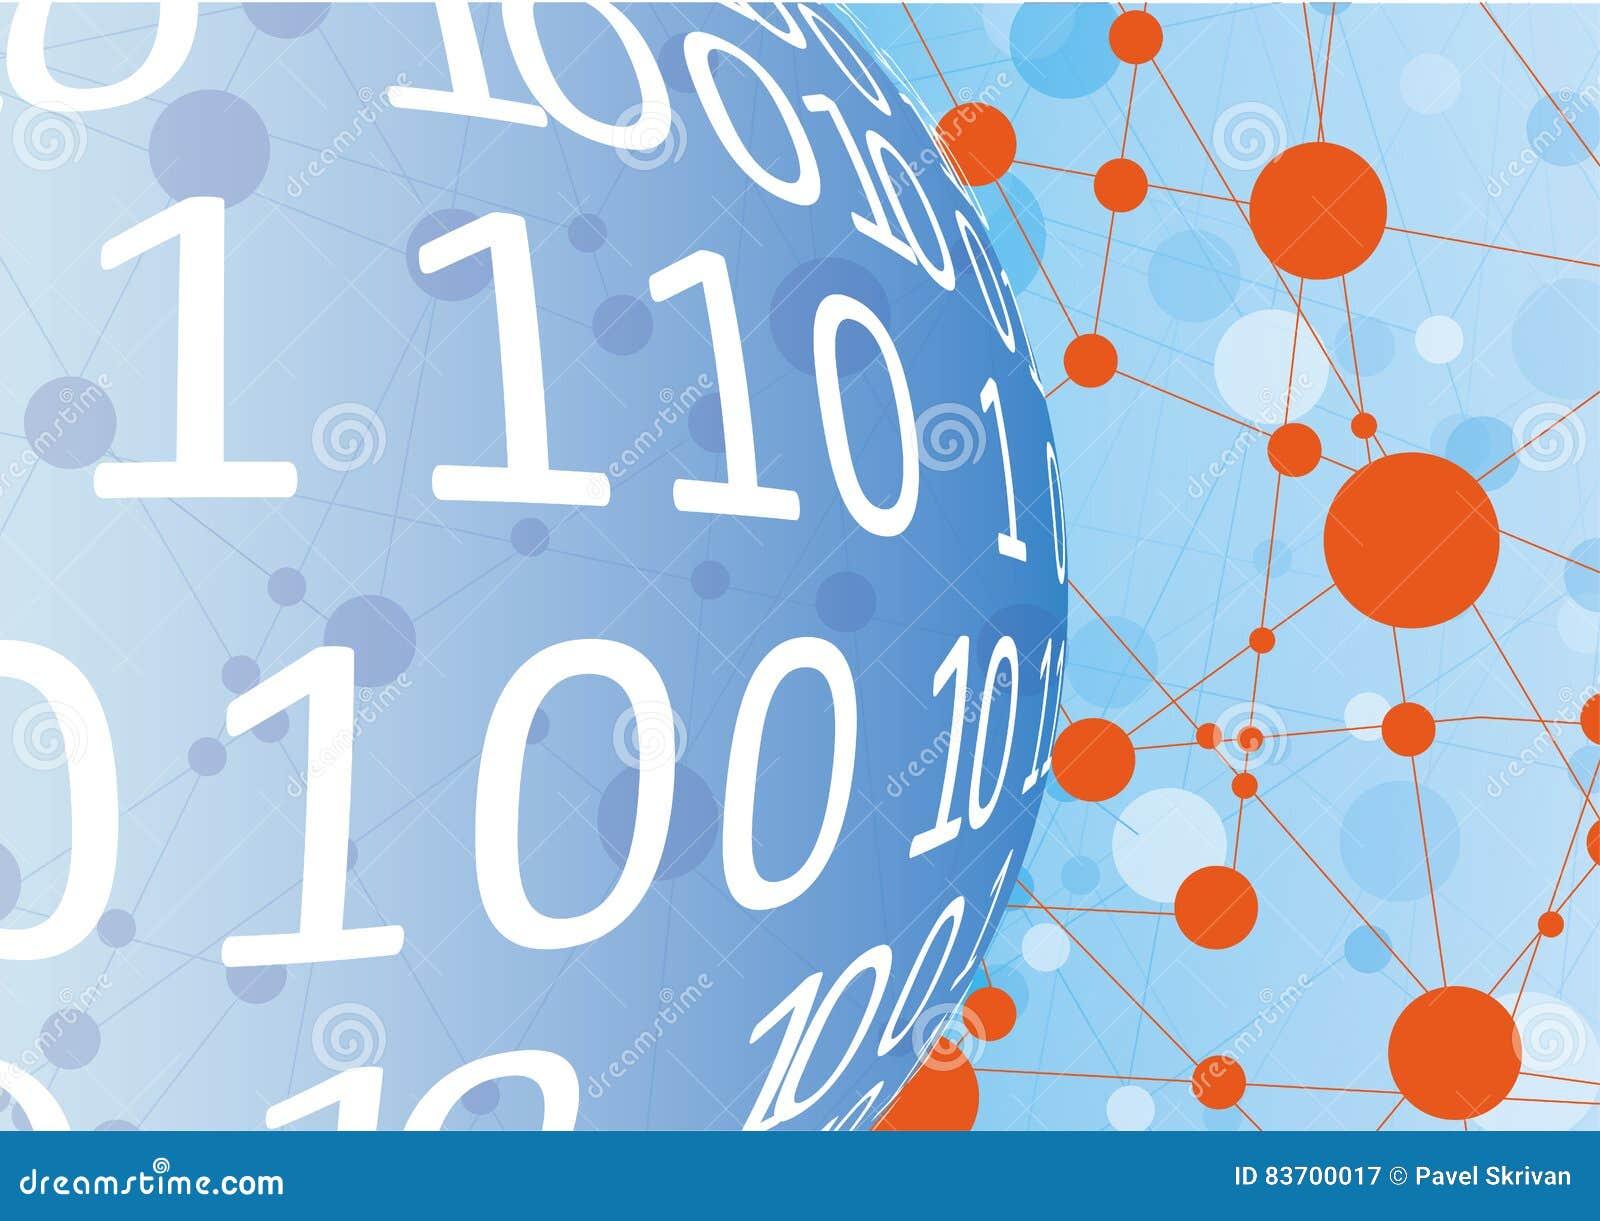 Vector Technology Stock Illustration